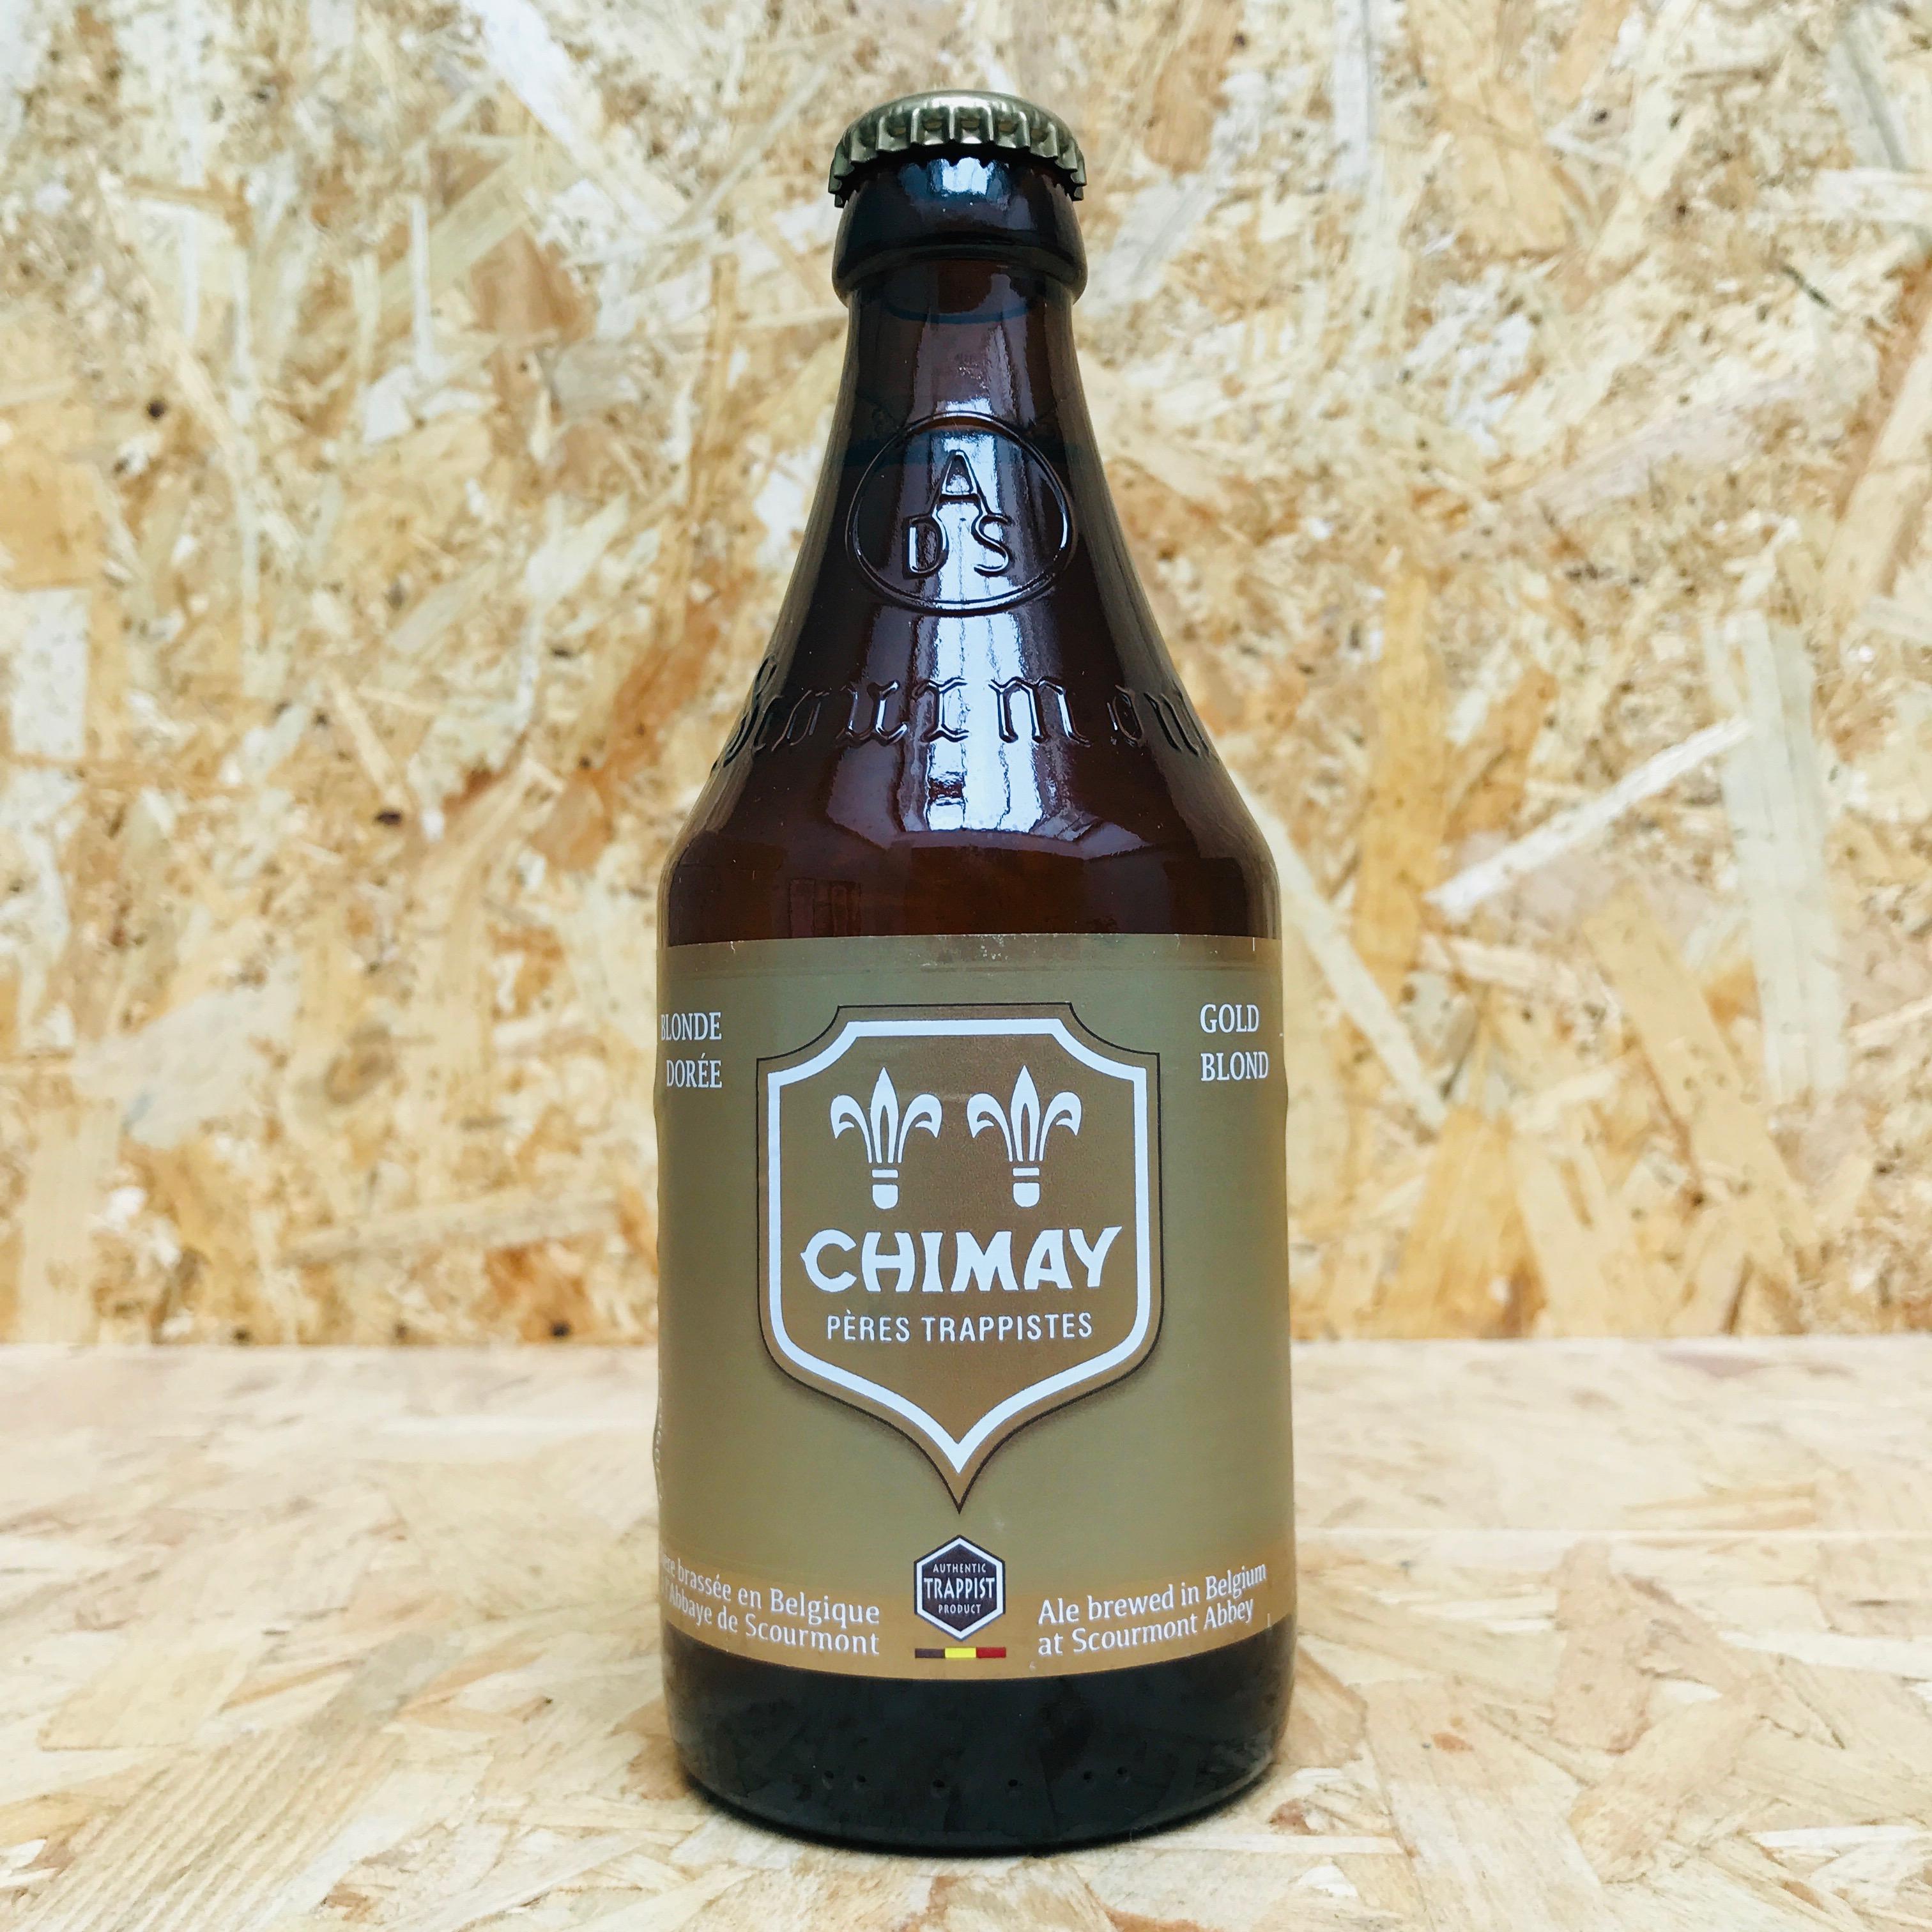 Chimay Gold